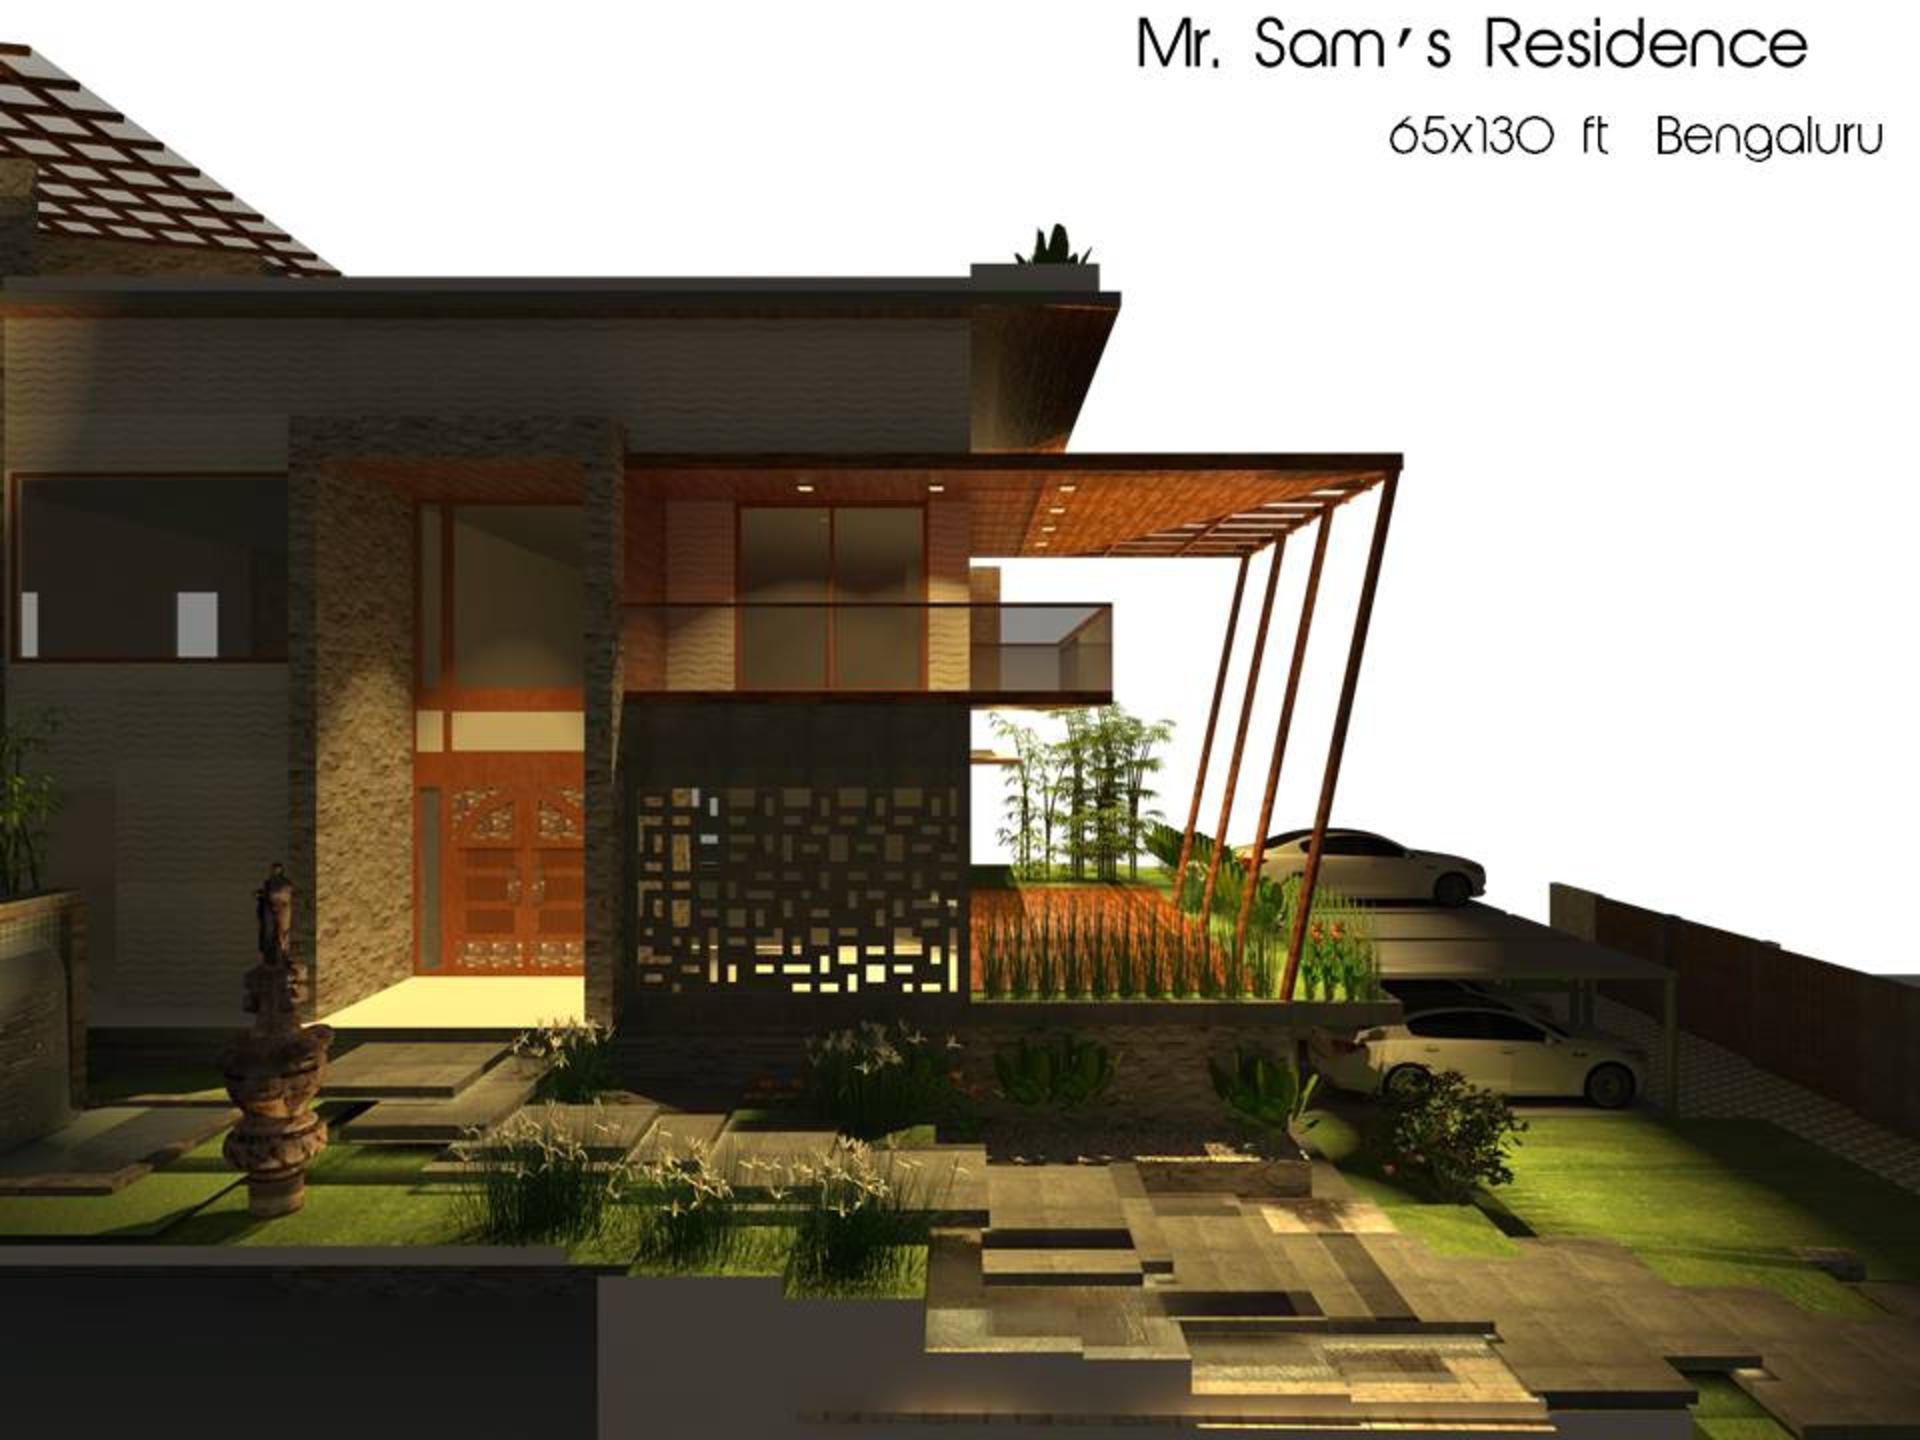 Sam's Residence  image